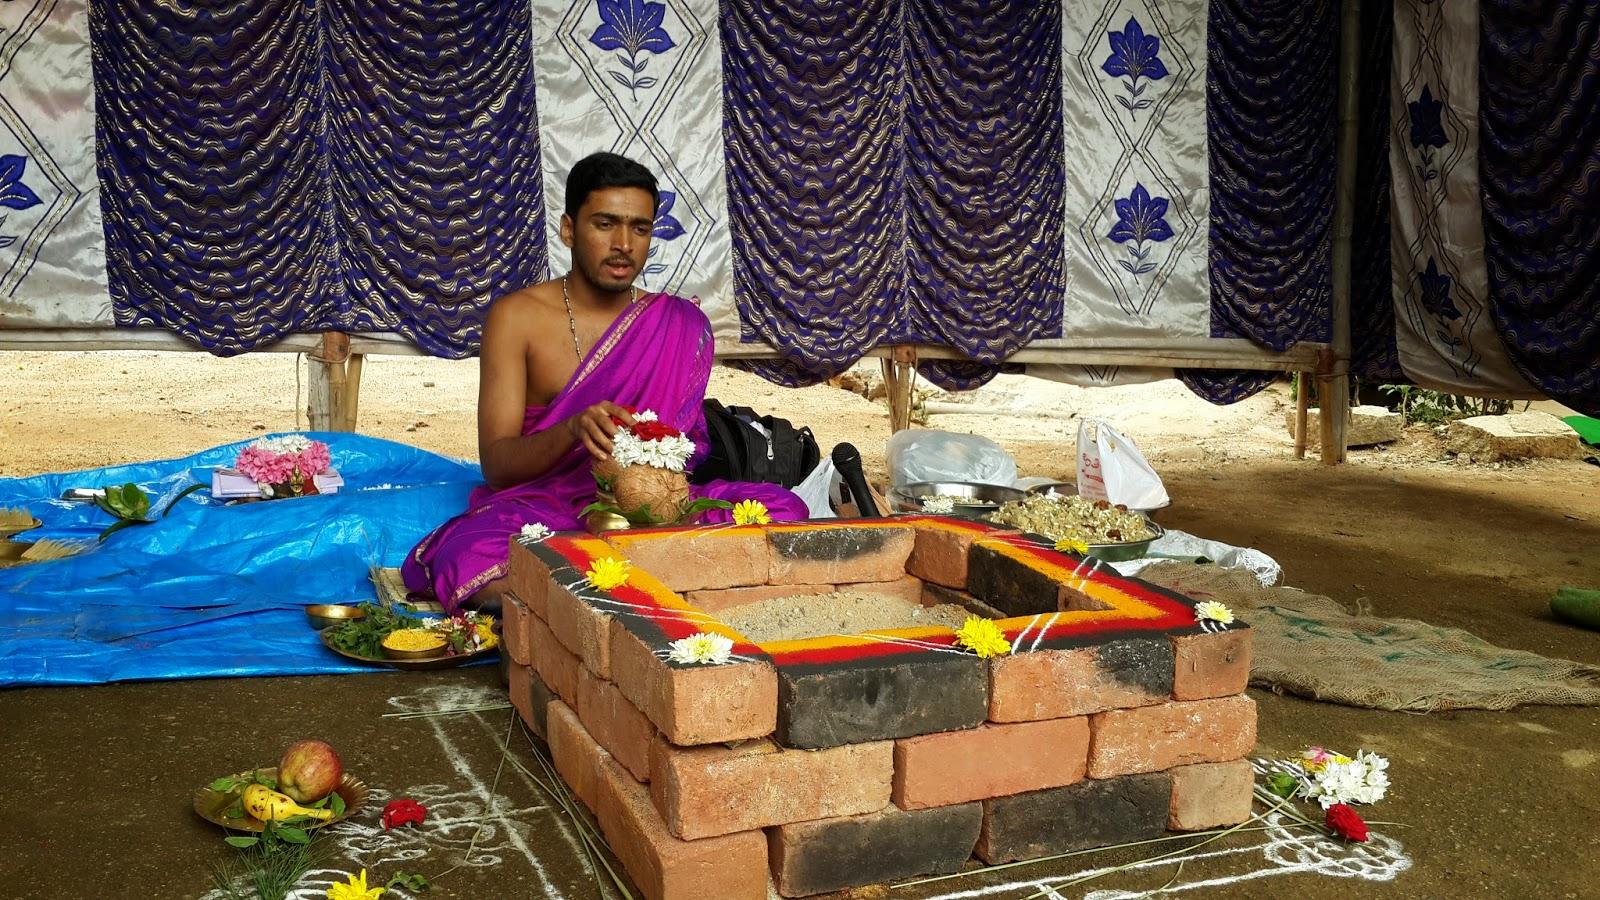 ganesh puja Ganesh pooja book page 1 of 11 ganesh pooja book page 2 of 11 ganesh pooja book page 3 of 11 ganesh pooja book page 4 of 11.